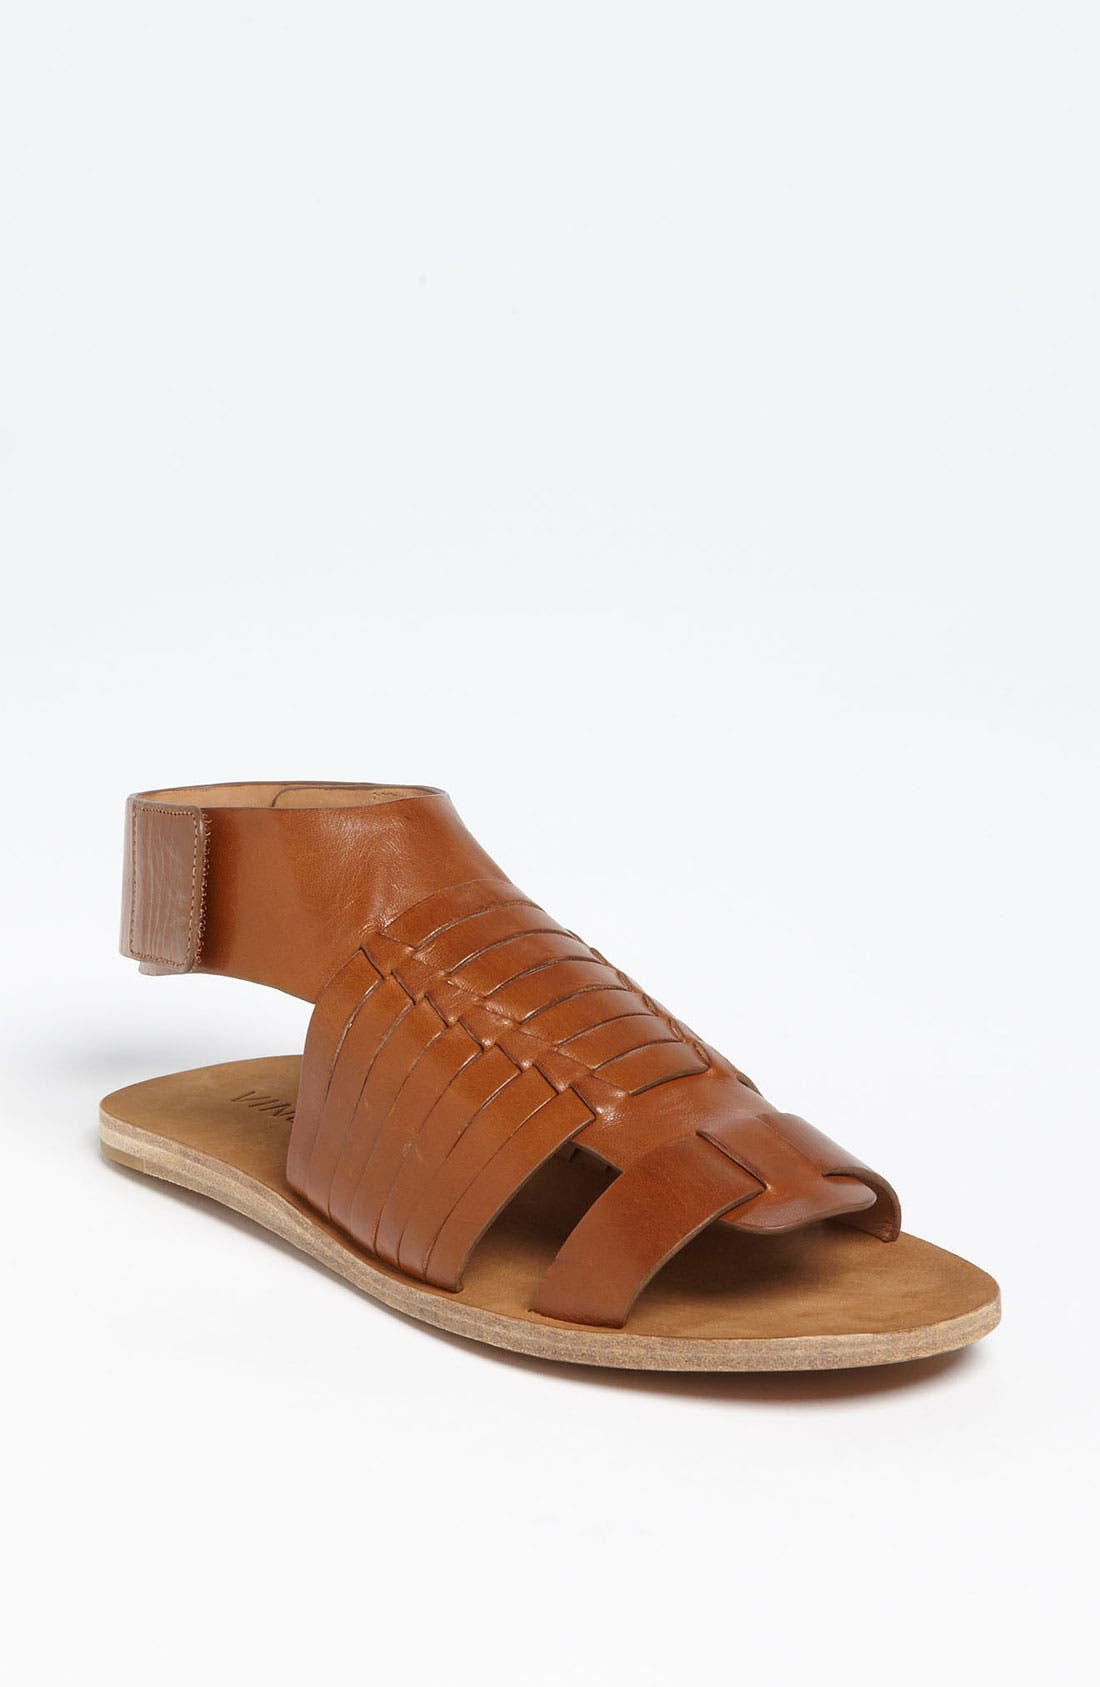 Alternate Image 1 Selected - Vince 'Calista' Sandal